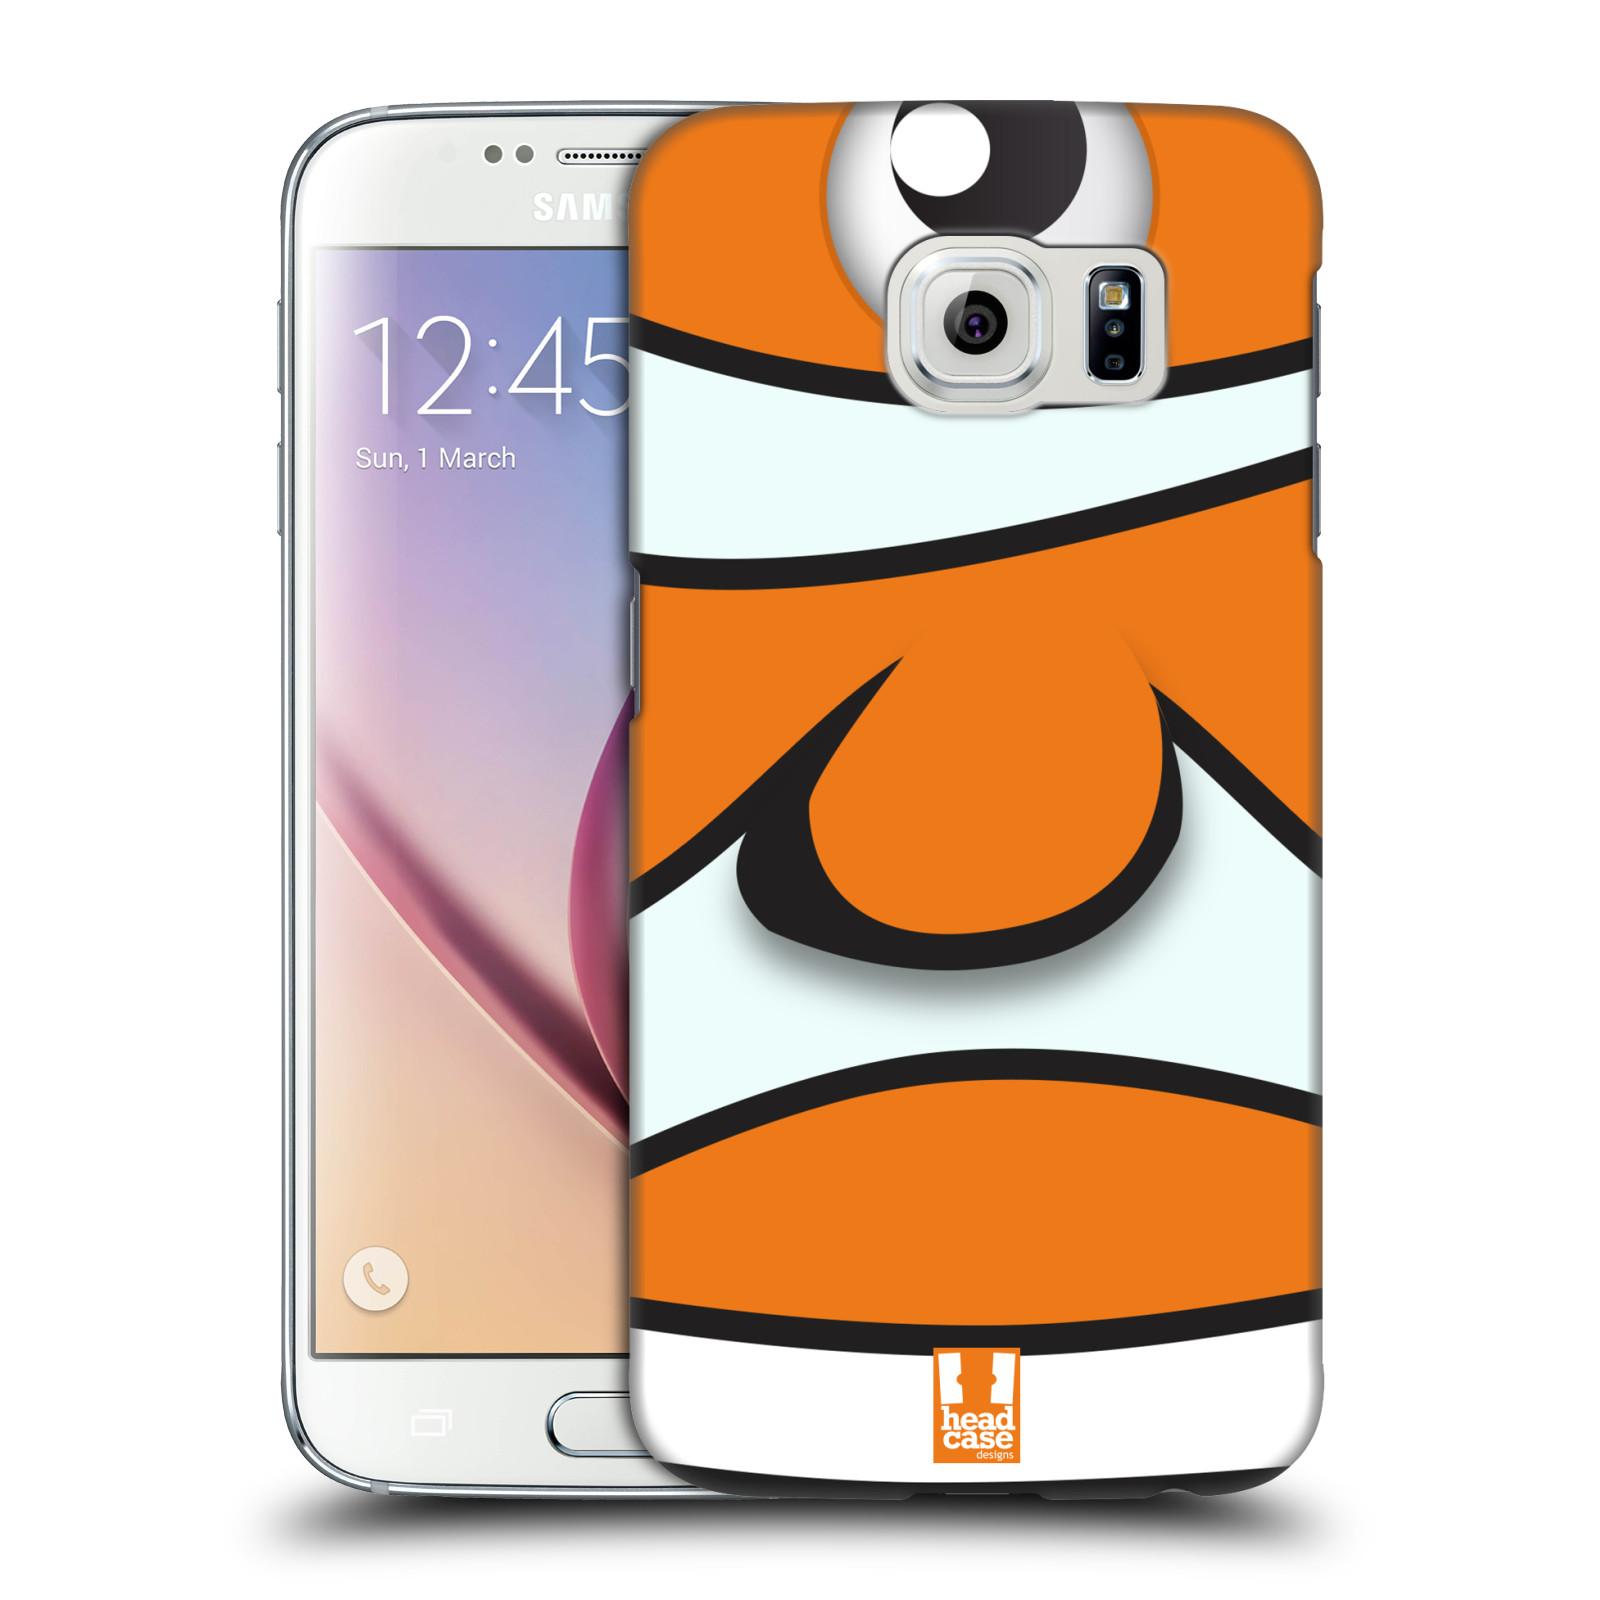 HEAD CASE plastový obal na mobil SAMSUNG Galaxy S6 (G9200, G920F) vzor Rybičky z profilu klaun oranžová NEMO